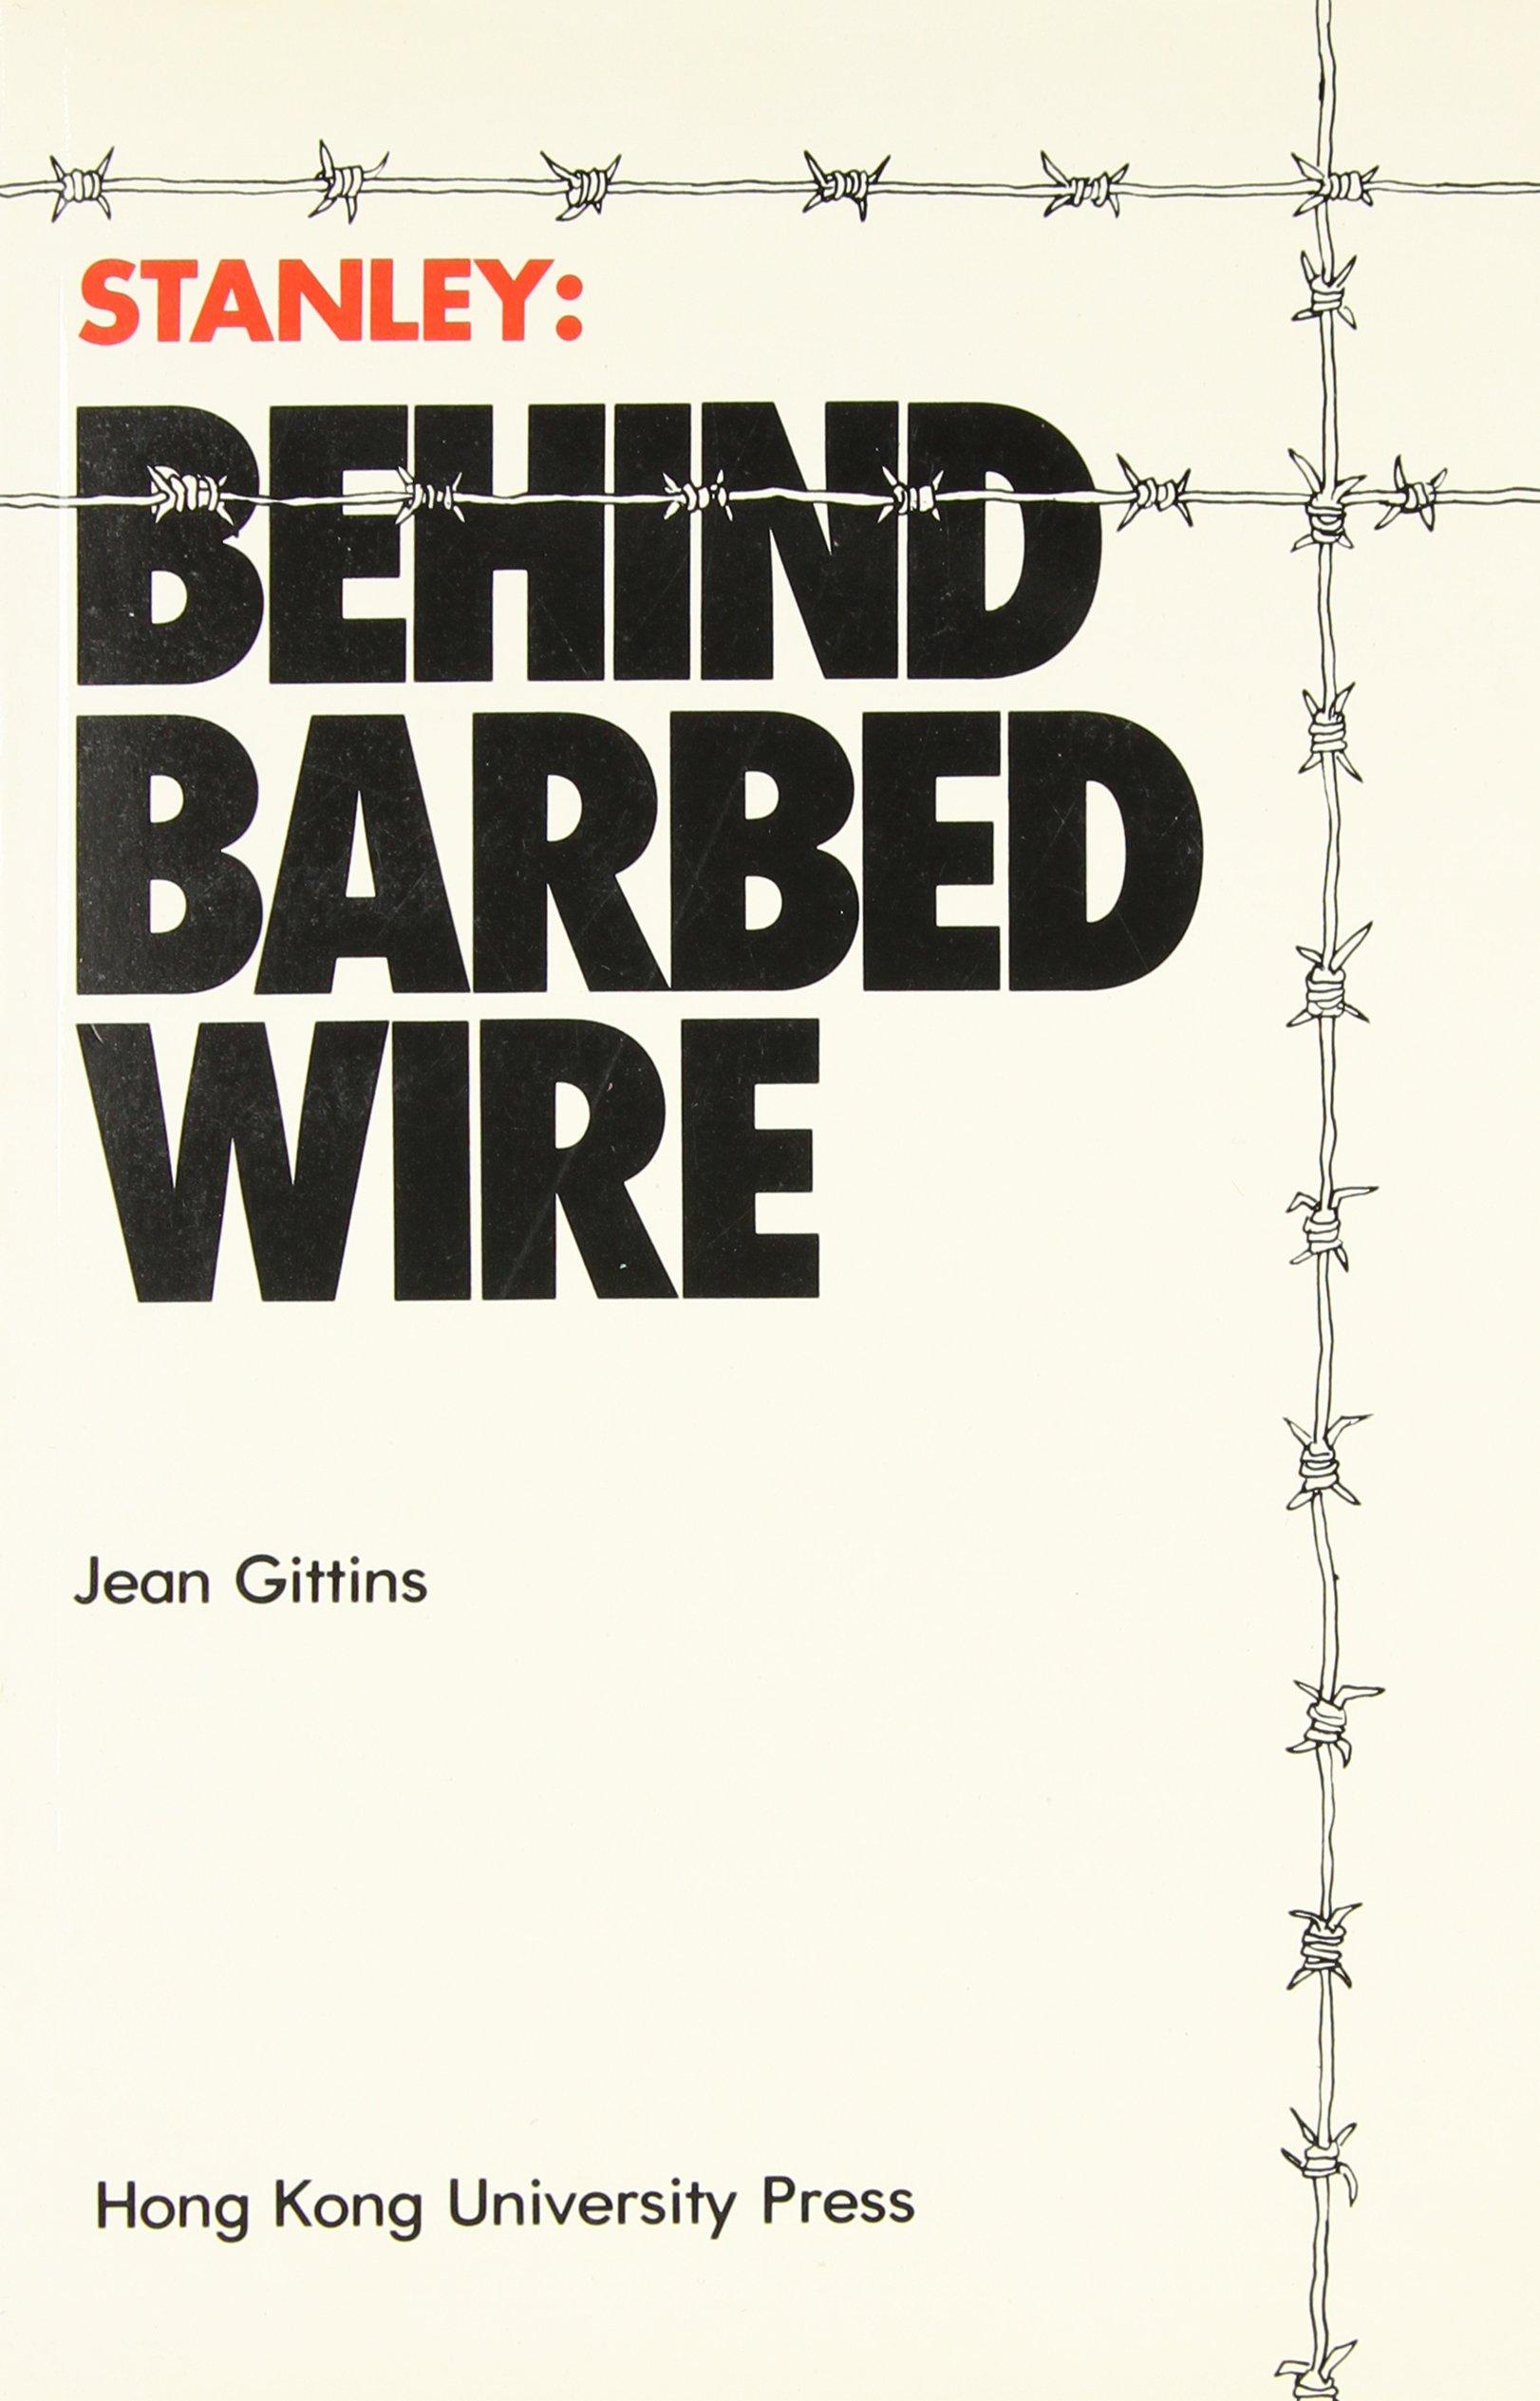 Stanley: Behind Barbed Wire: Jean Gittins: 9789622090613: Amazon.com ...